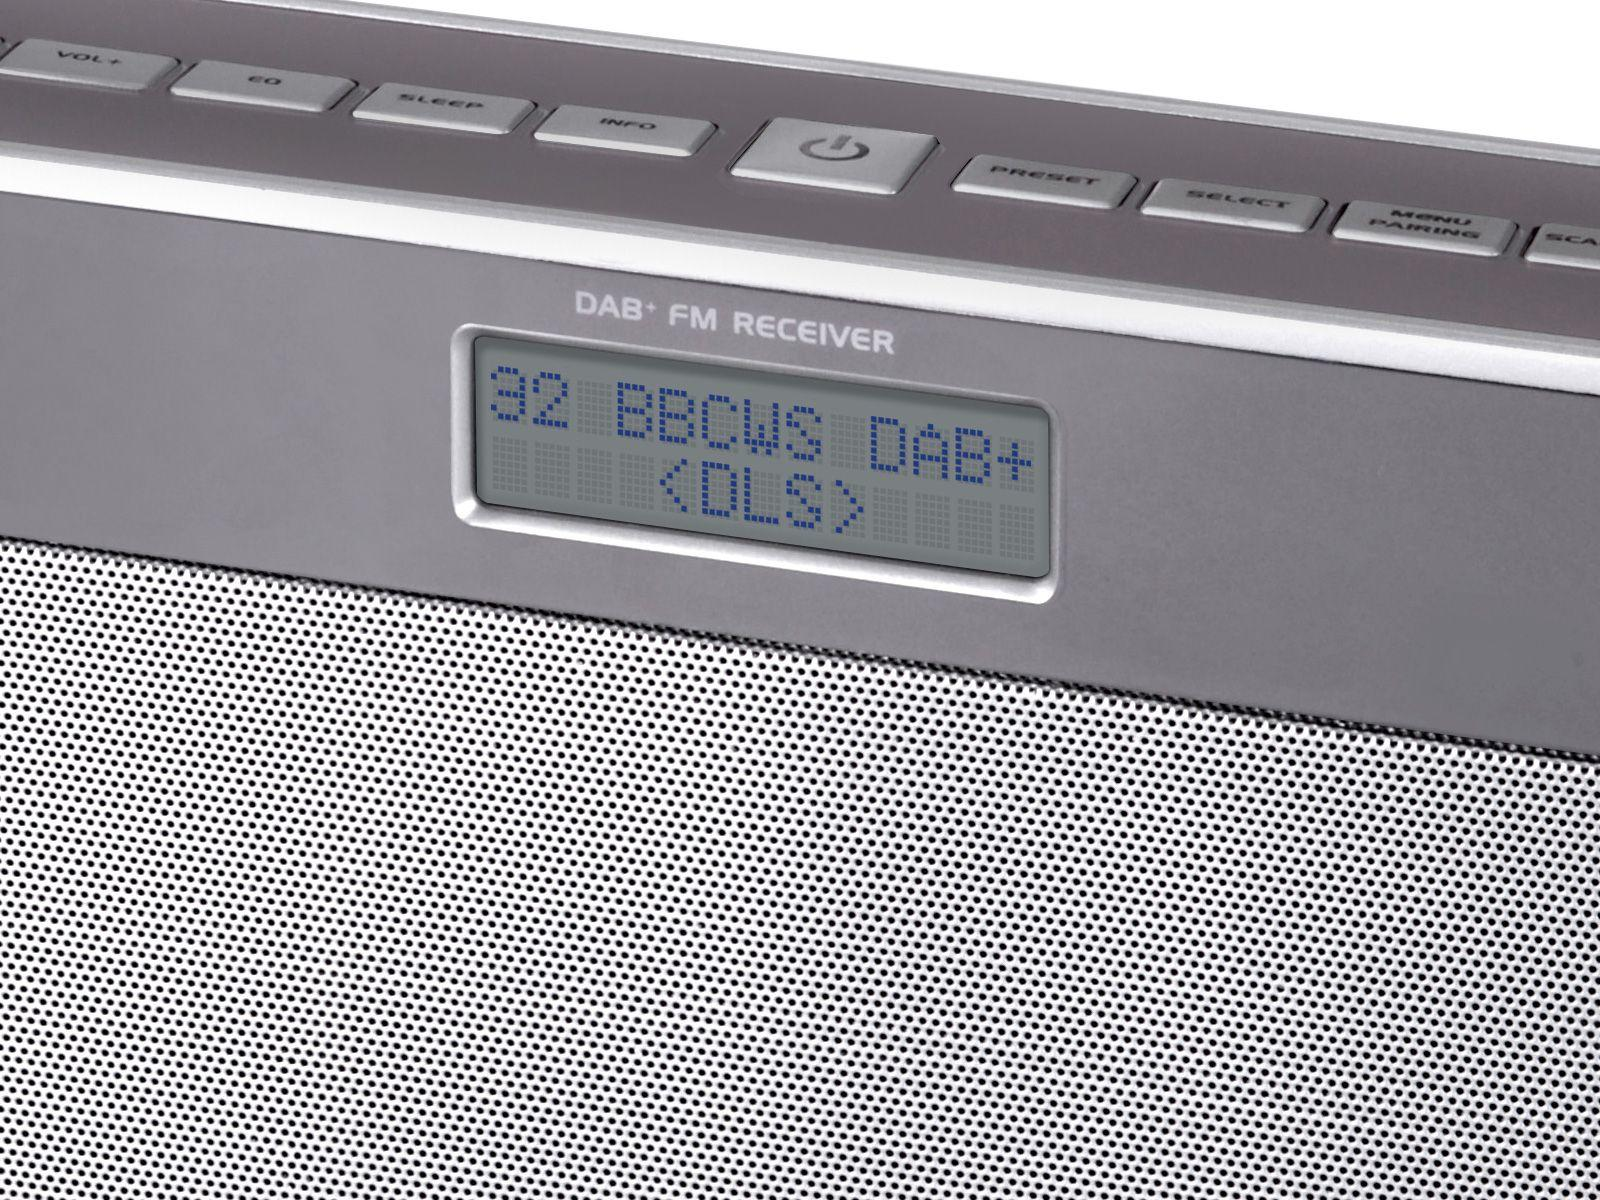 Buy Soundmaster Dab750si Rechargeable Bluetooth Fm Dab Radio